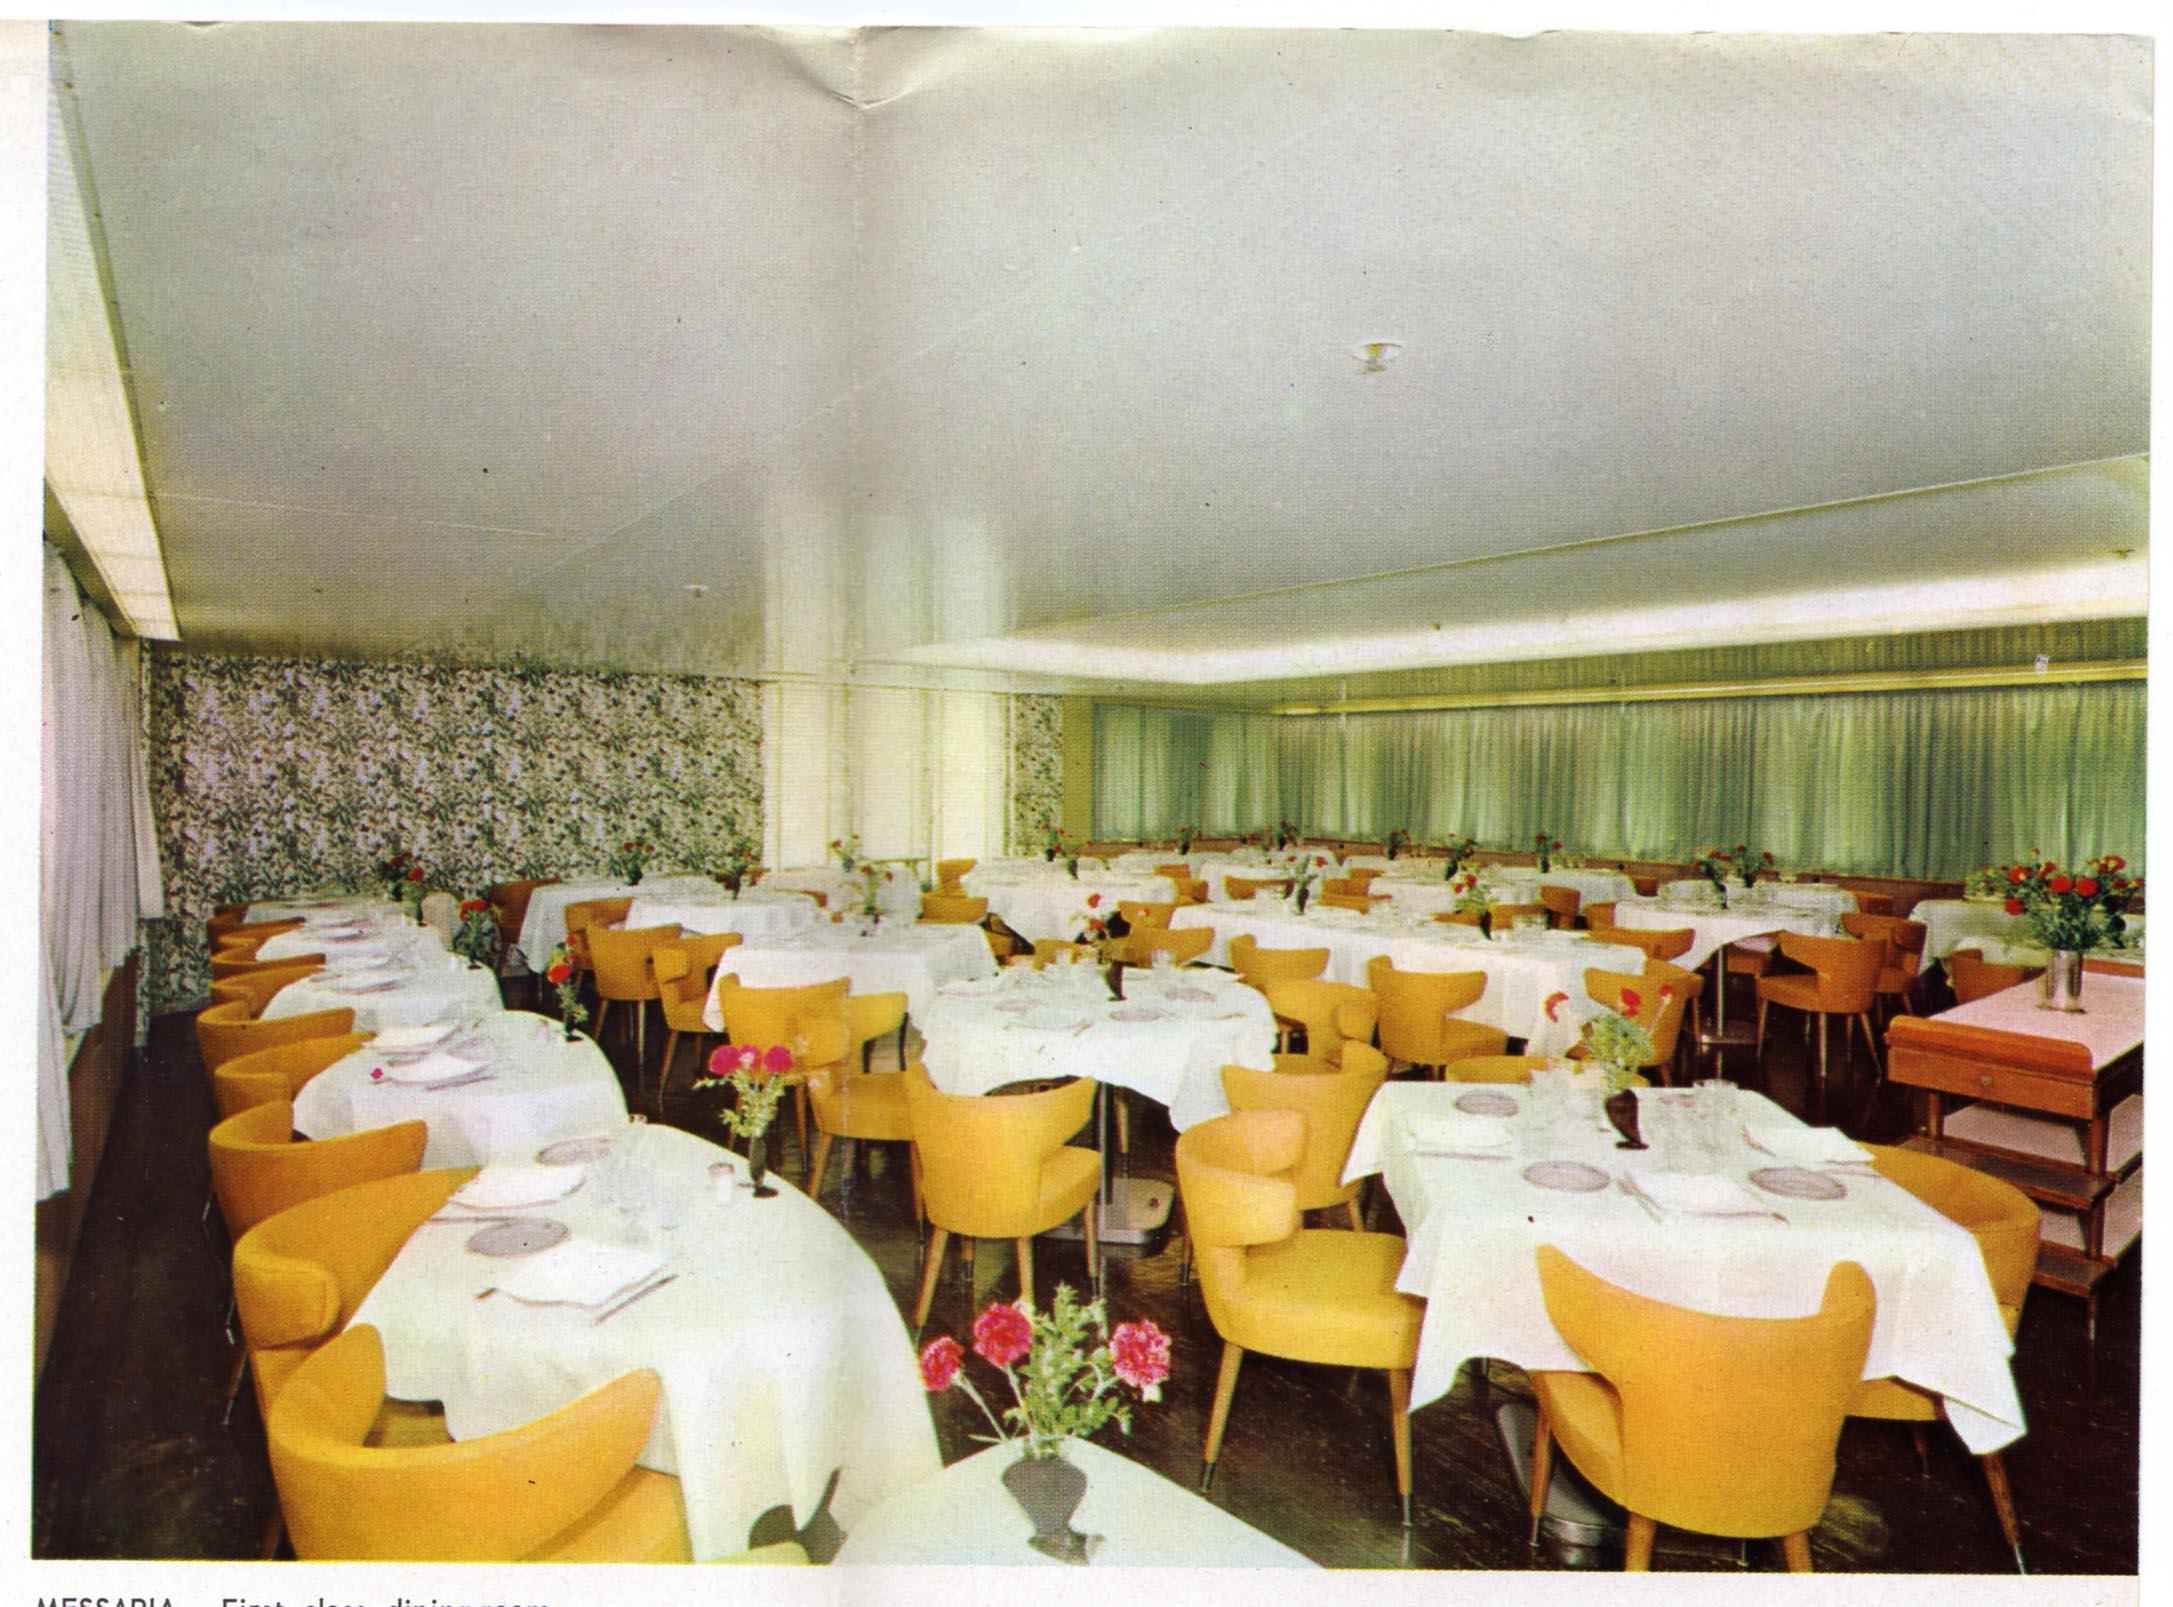 Navi e armatori approdi di passione - Sala da pranzo inglese ...